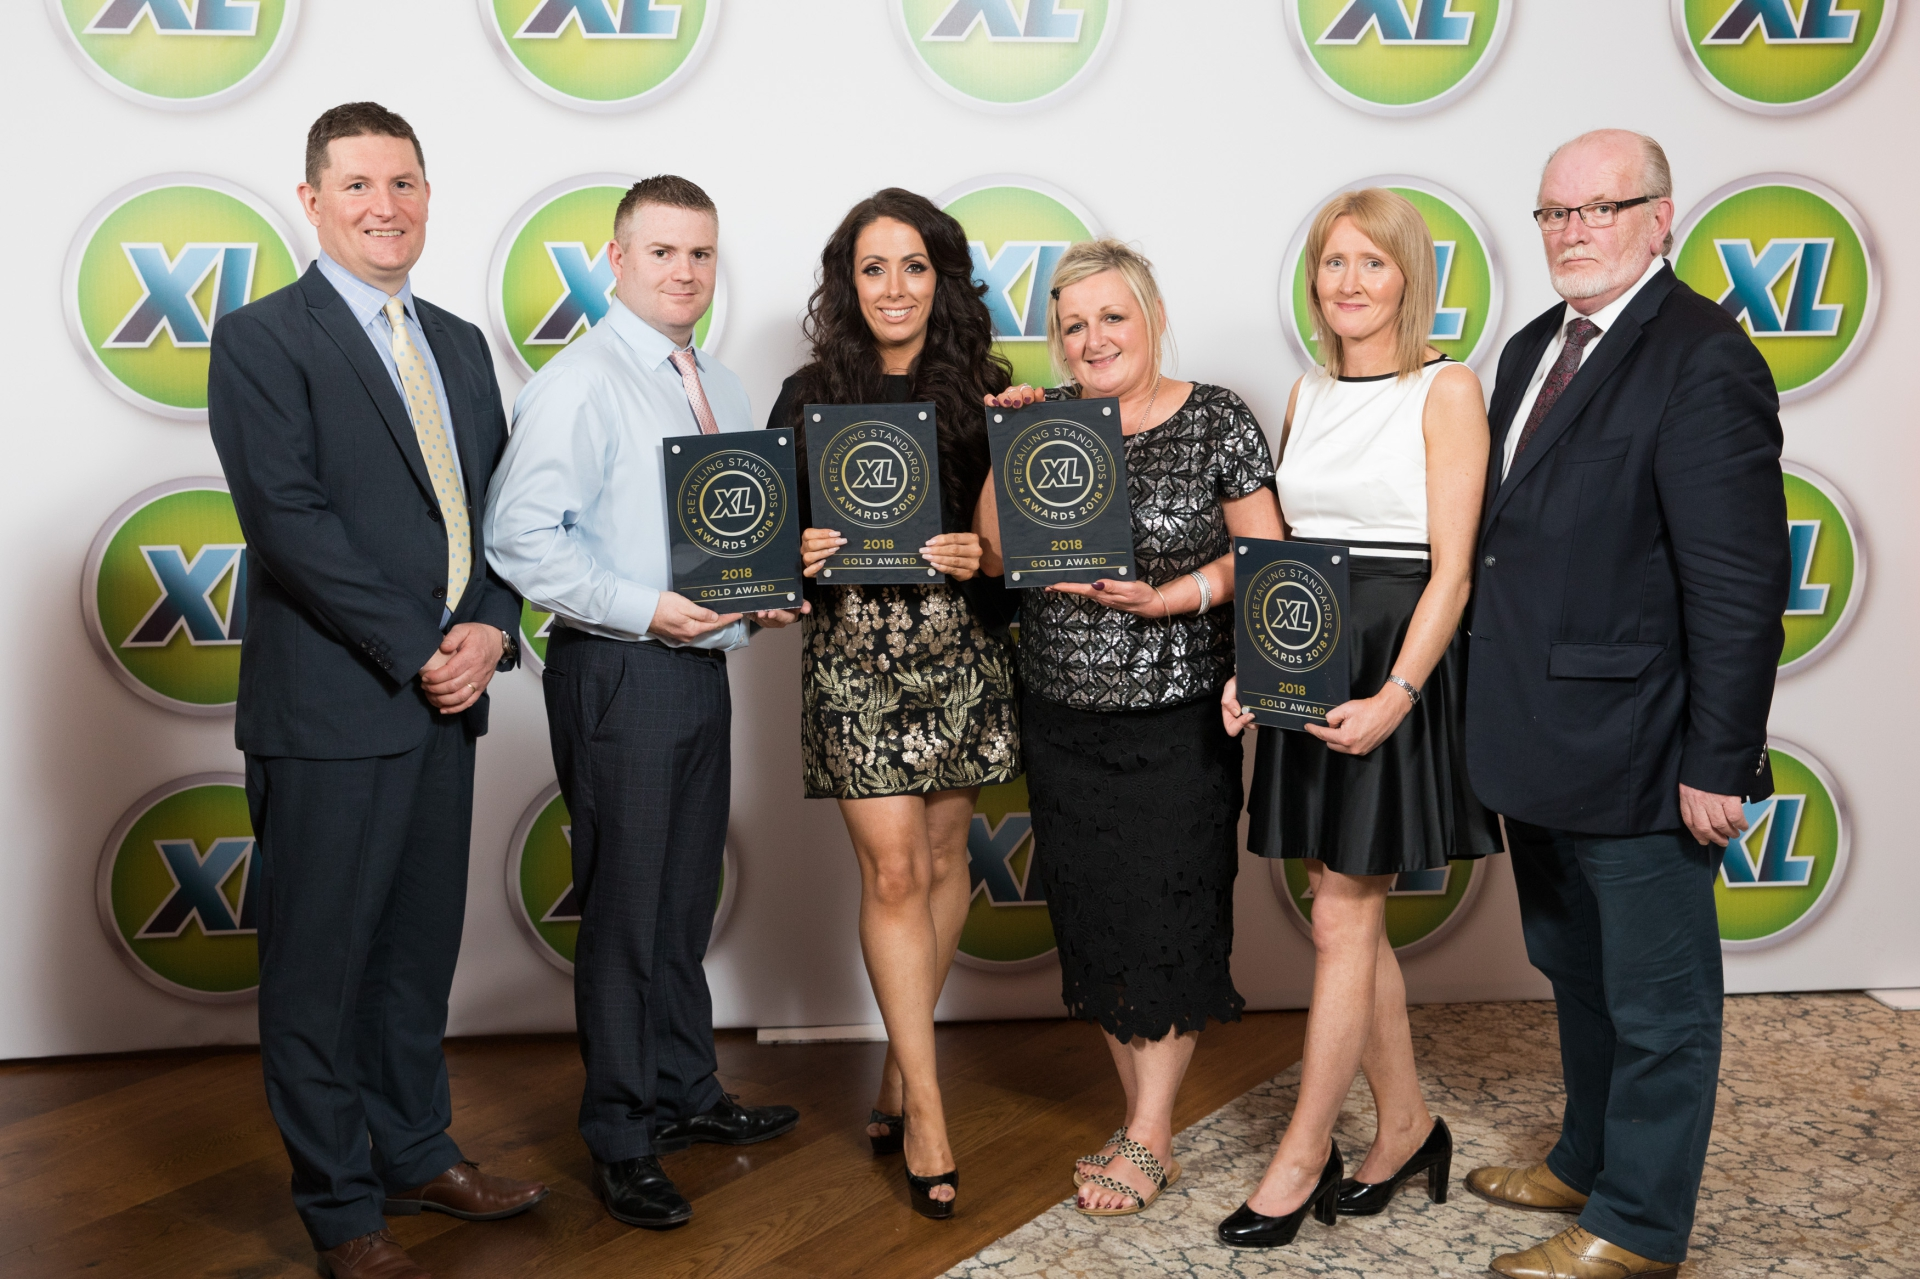 Tipperary XL awards